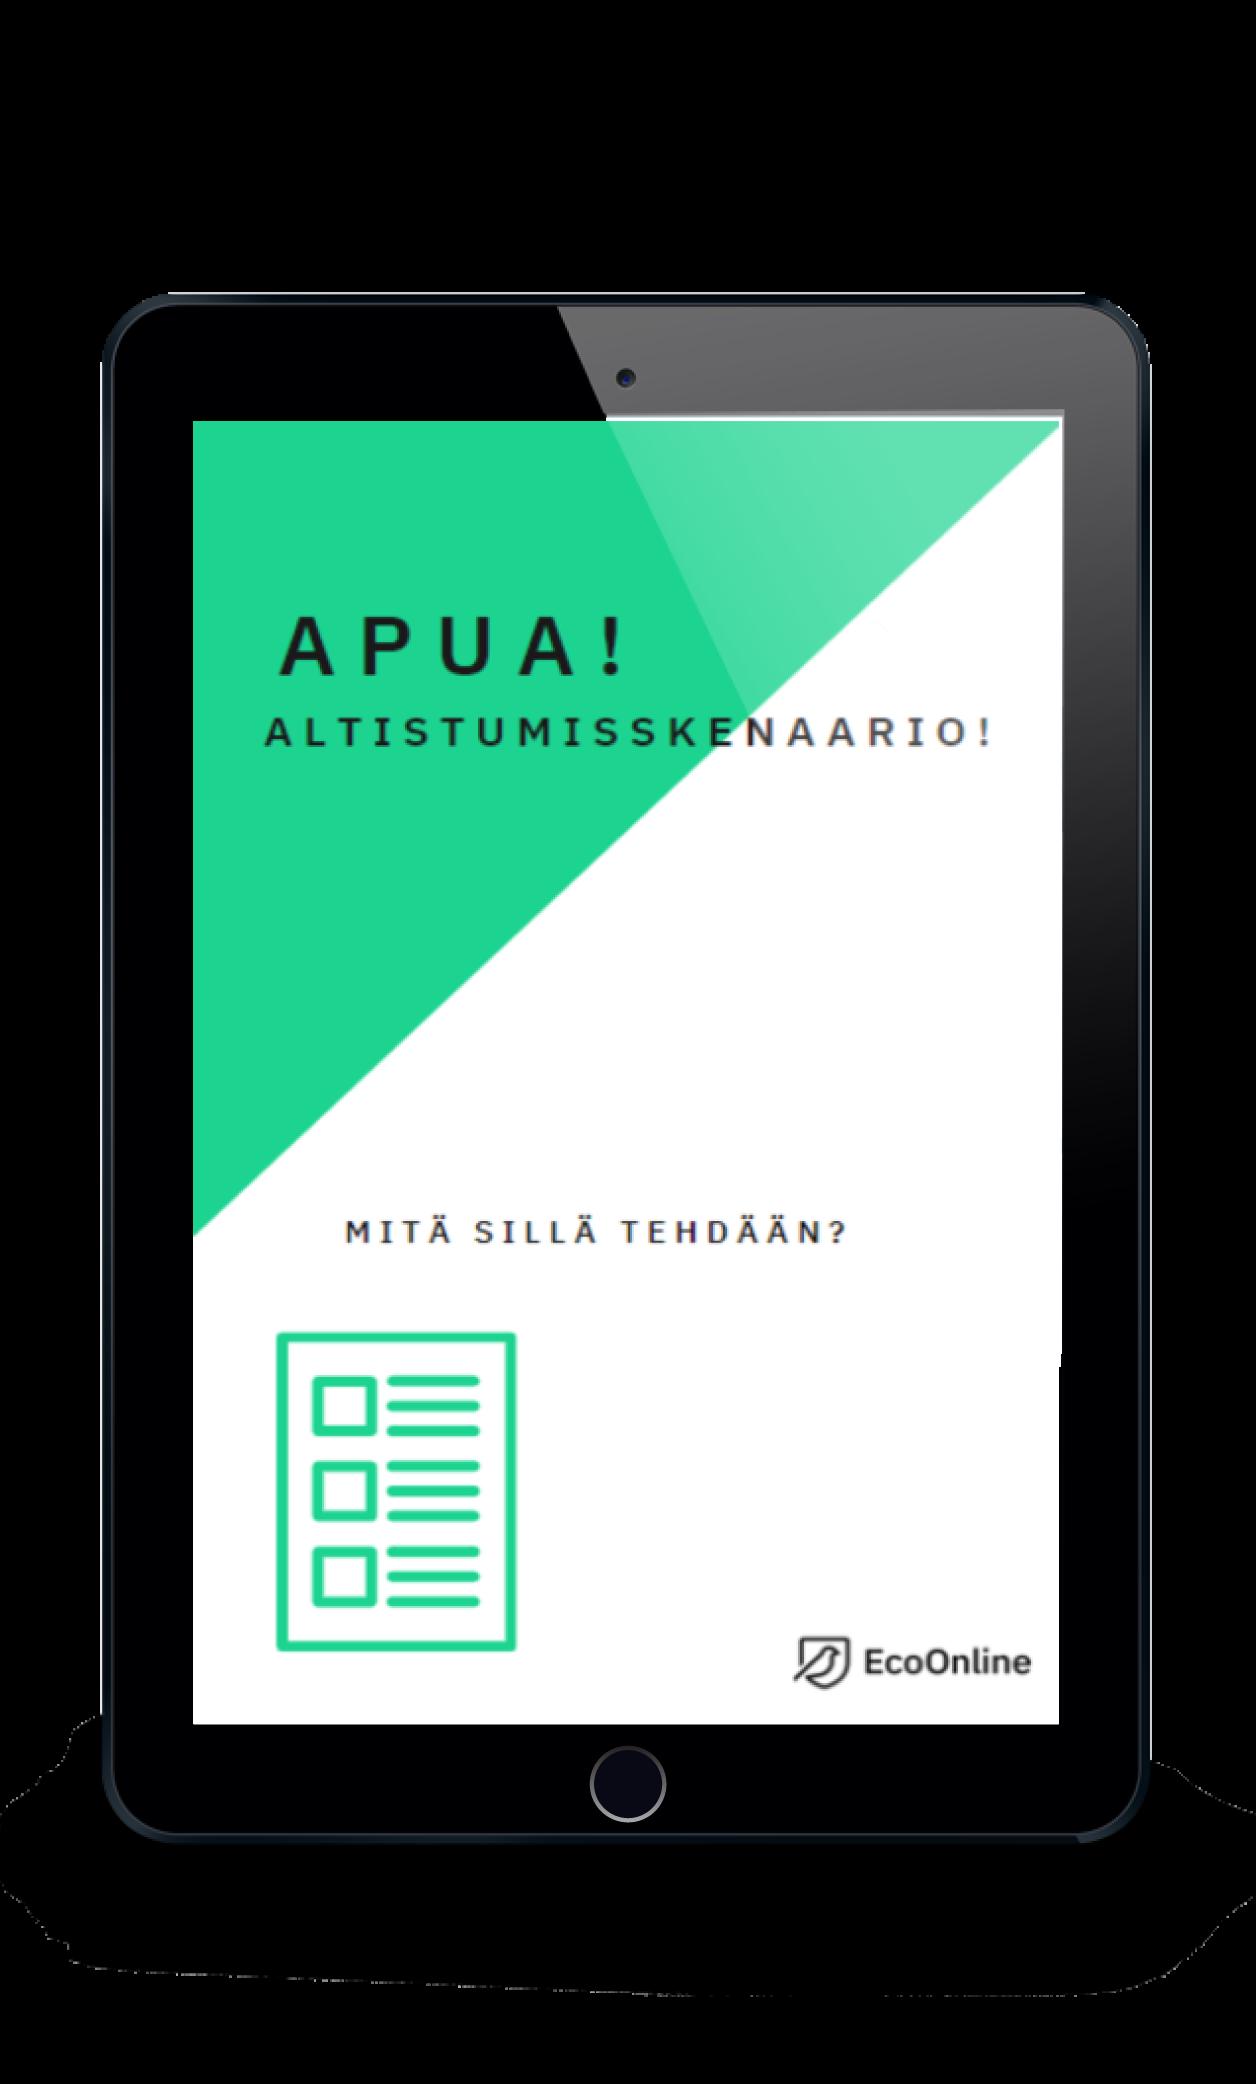 FI_Book Covers_Altistumisskenaario